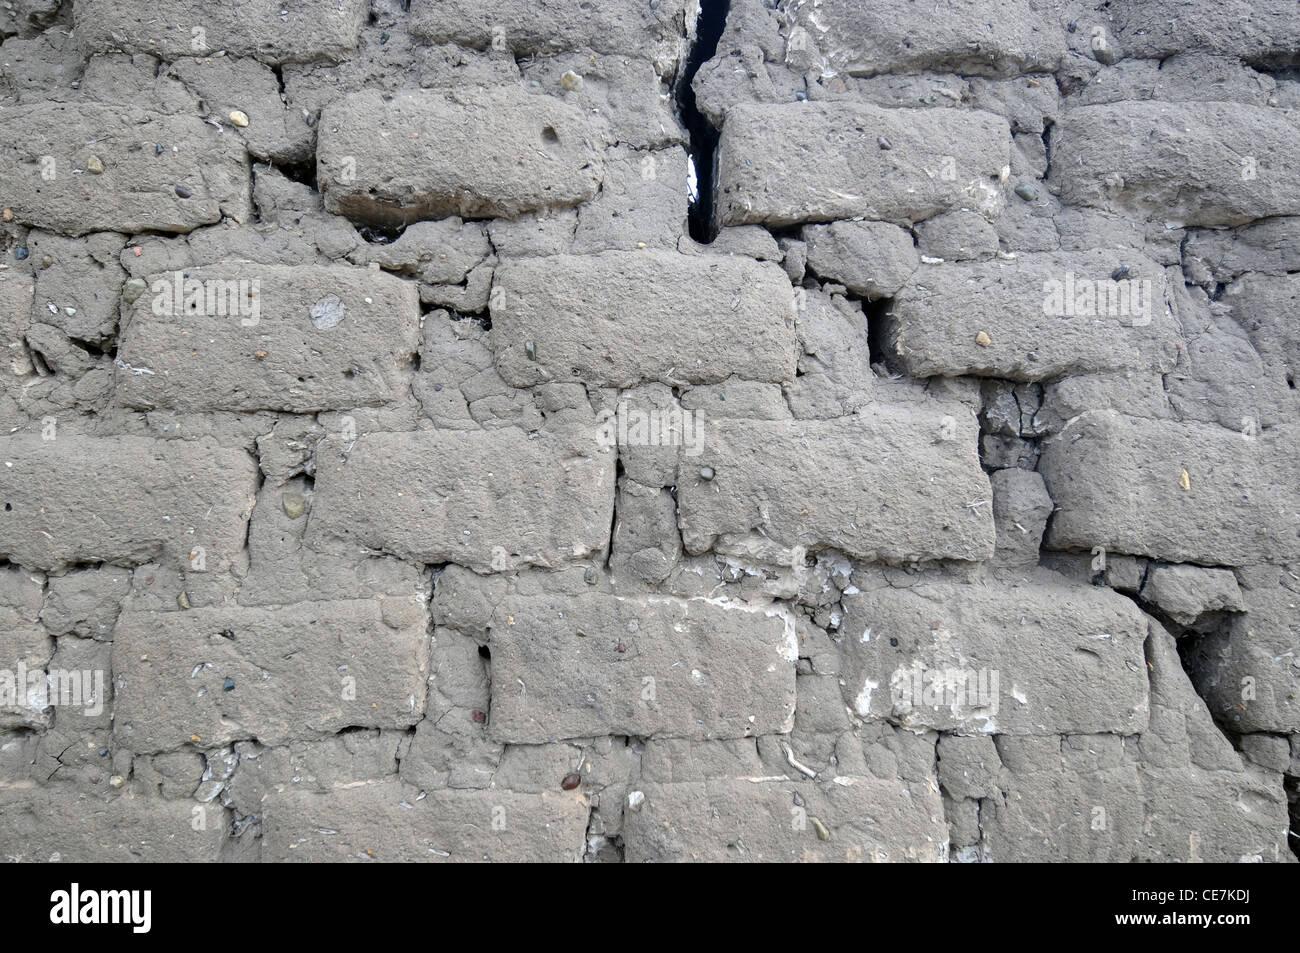 Old mud-brick wall of house, Patagonia, Argentina - Stock Image